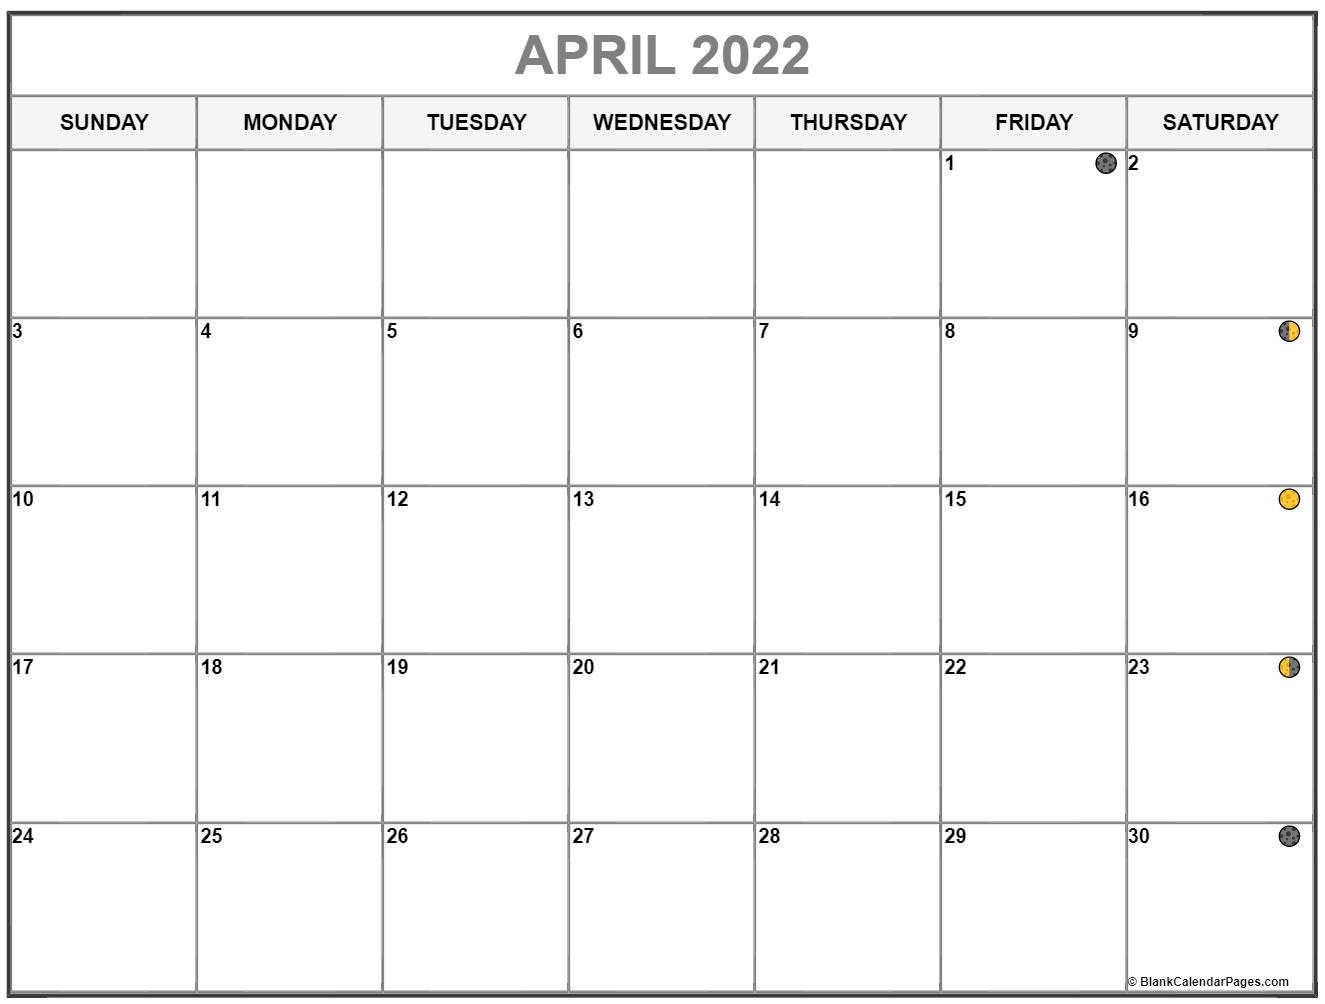 April 2022 Lunar Calendar | Moon Phase Calendar